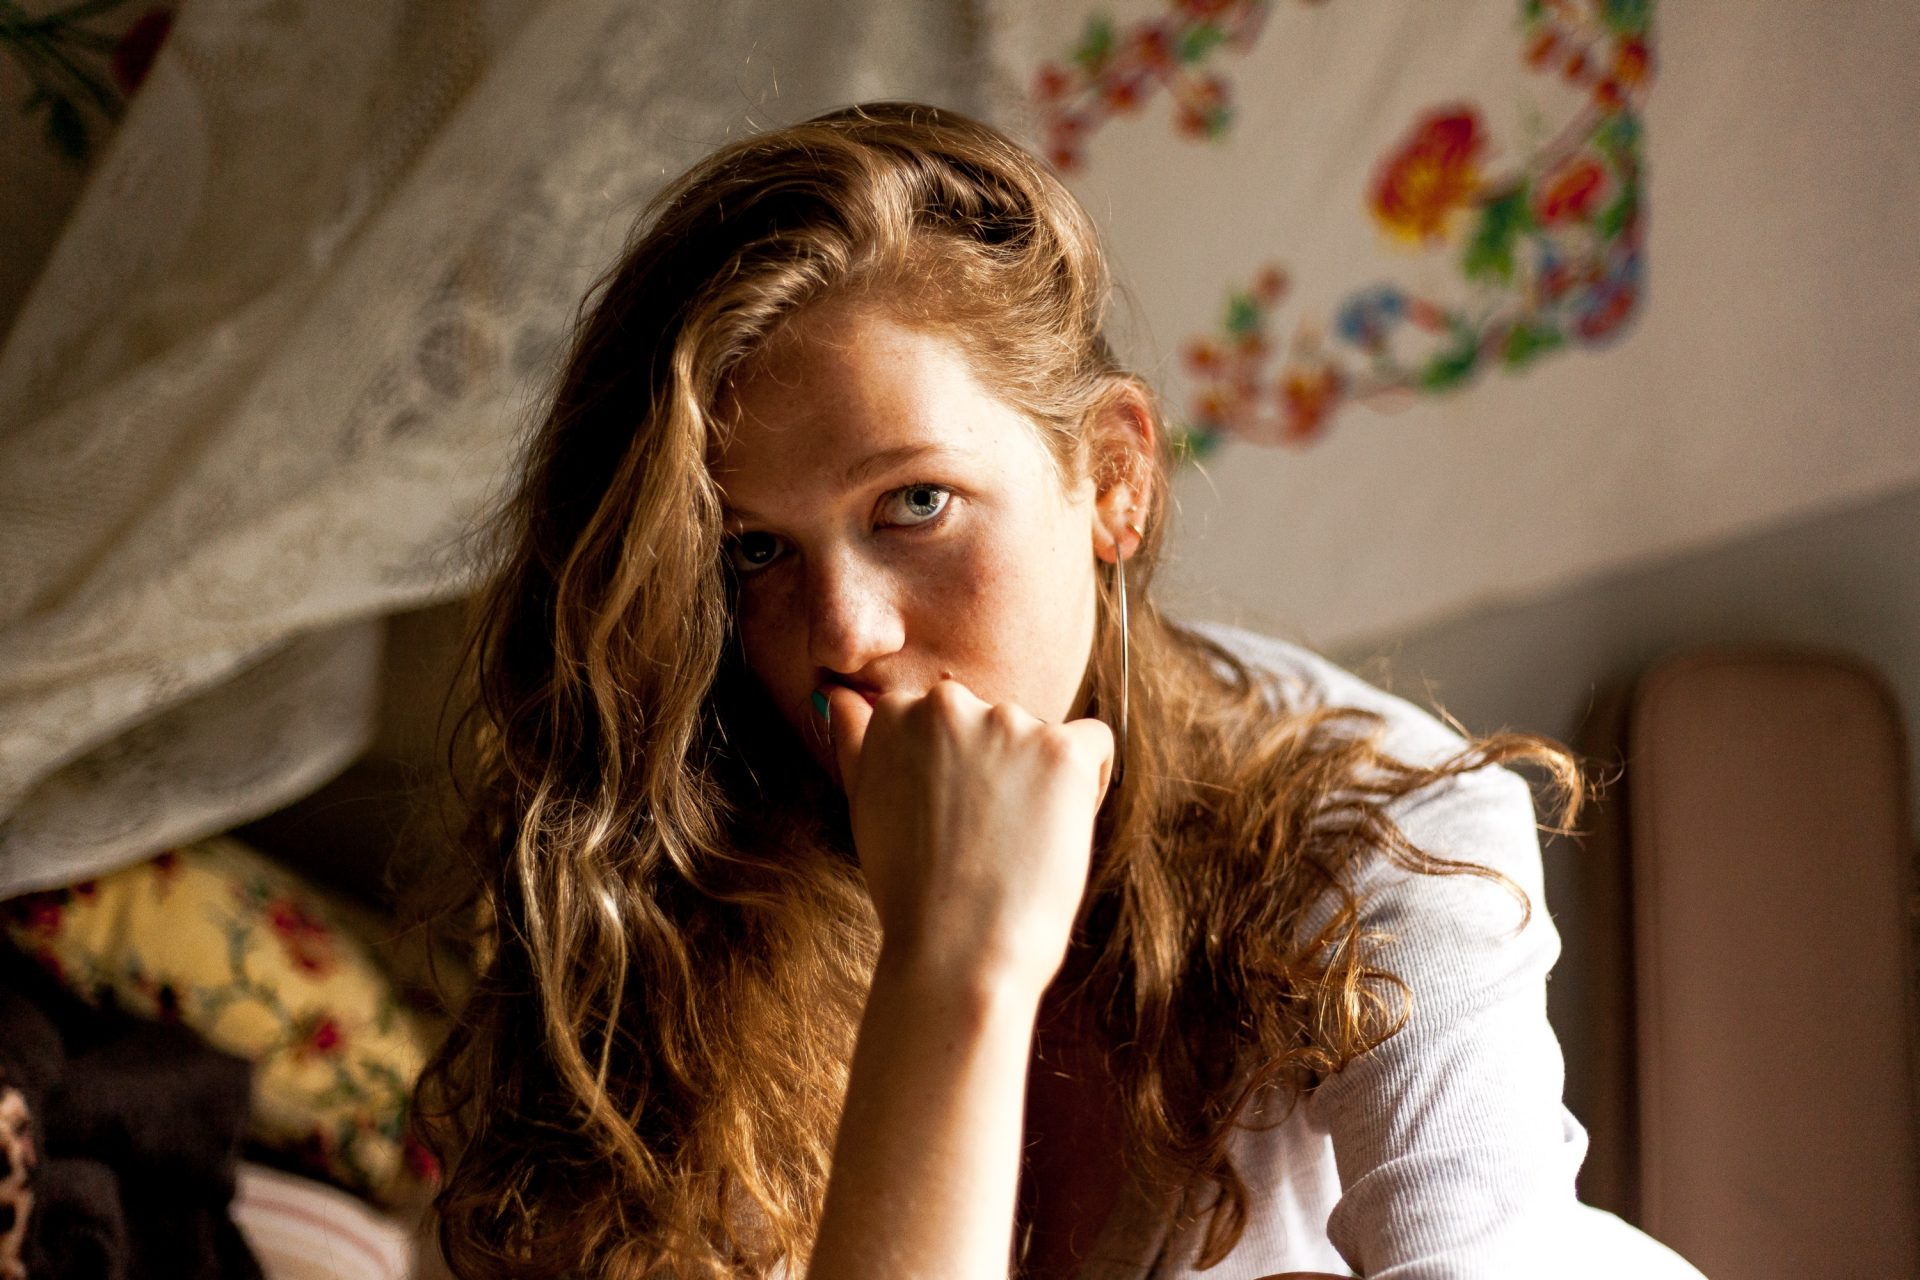 Gabrielle Marlena